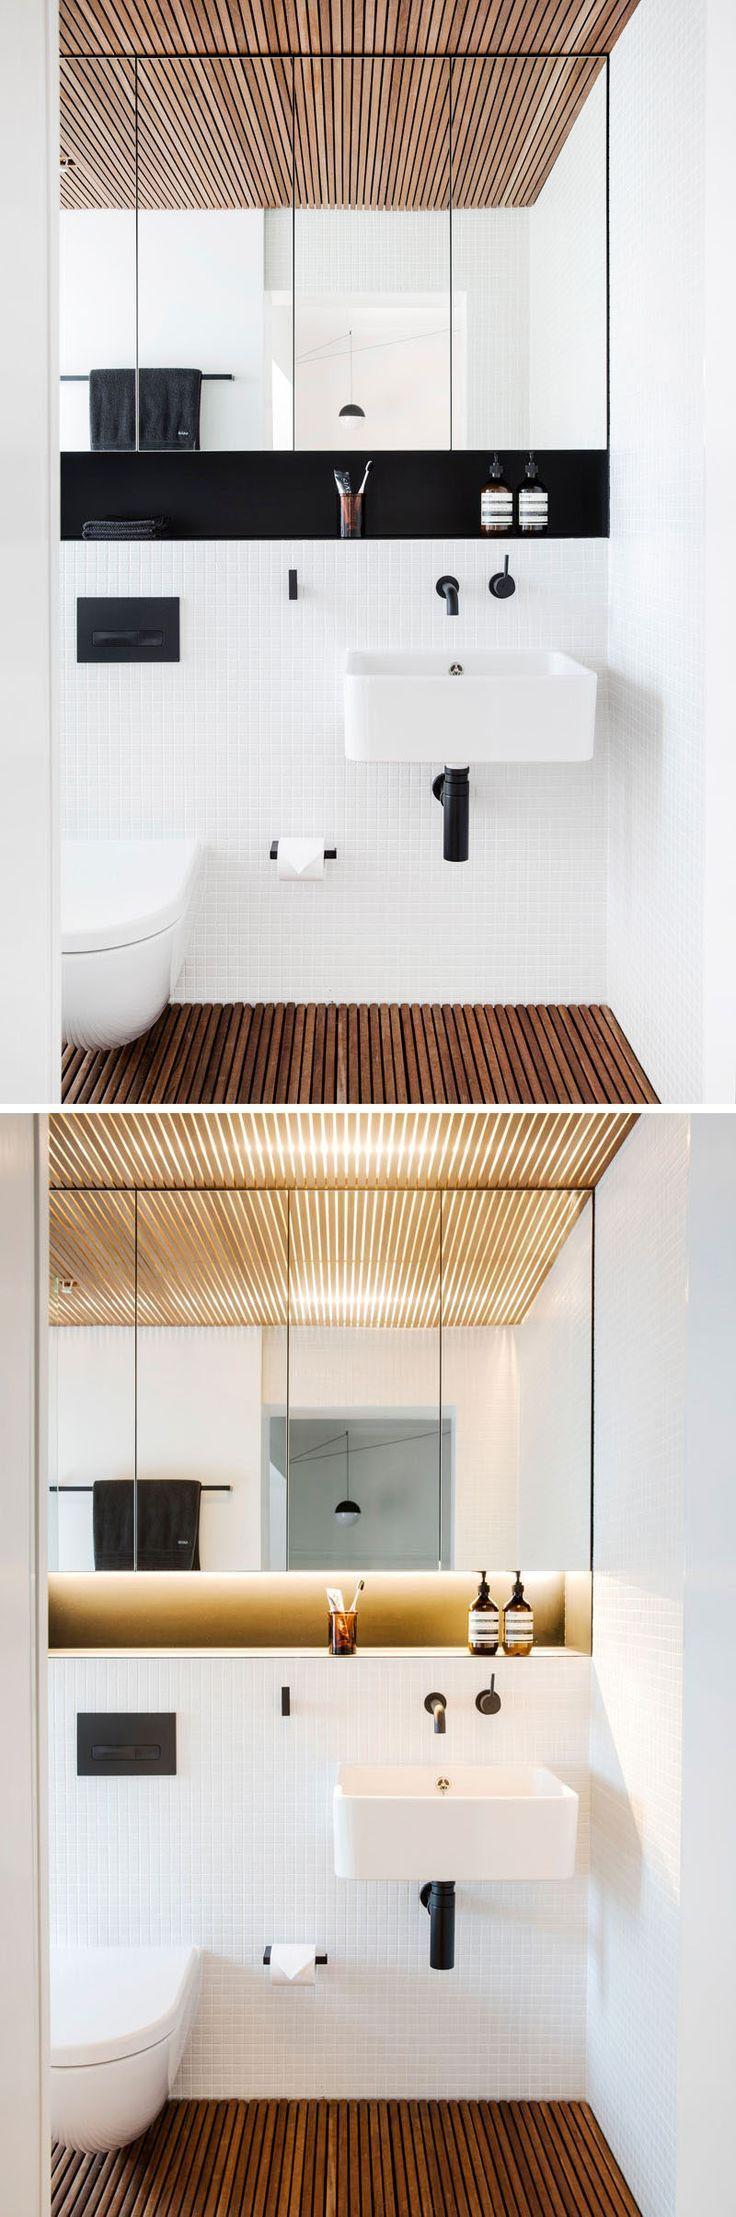 236 square feet apartment in Sydney, Australia / Architect Prineas